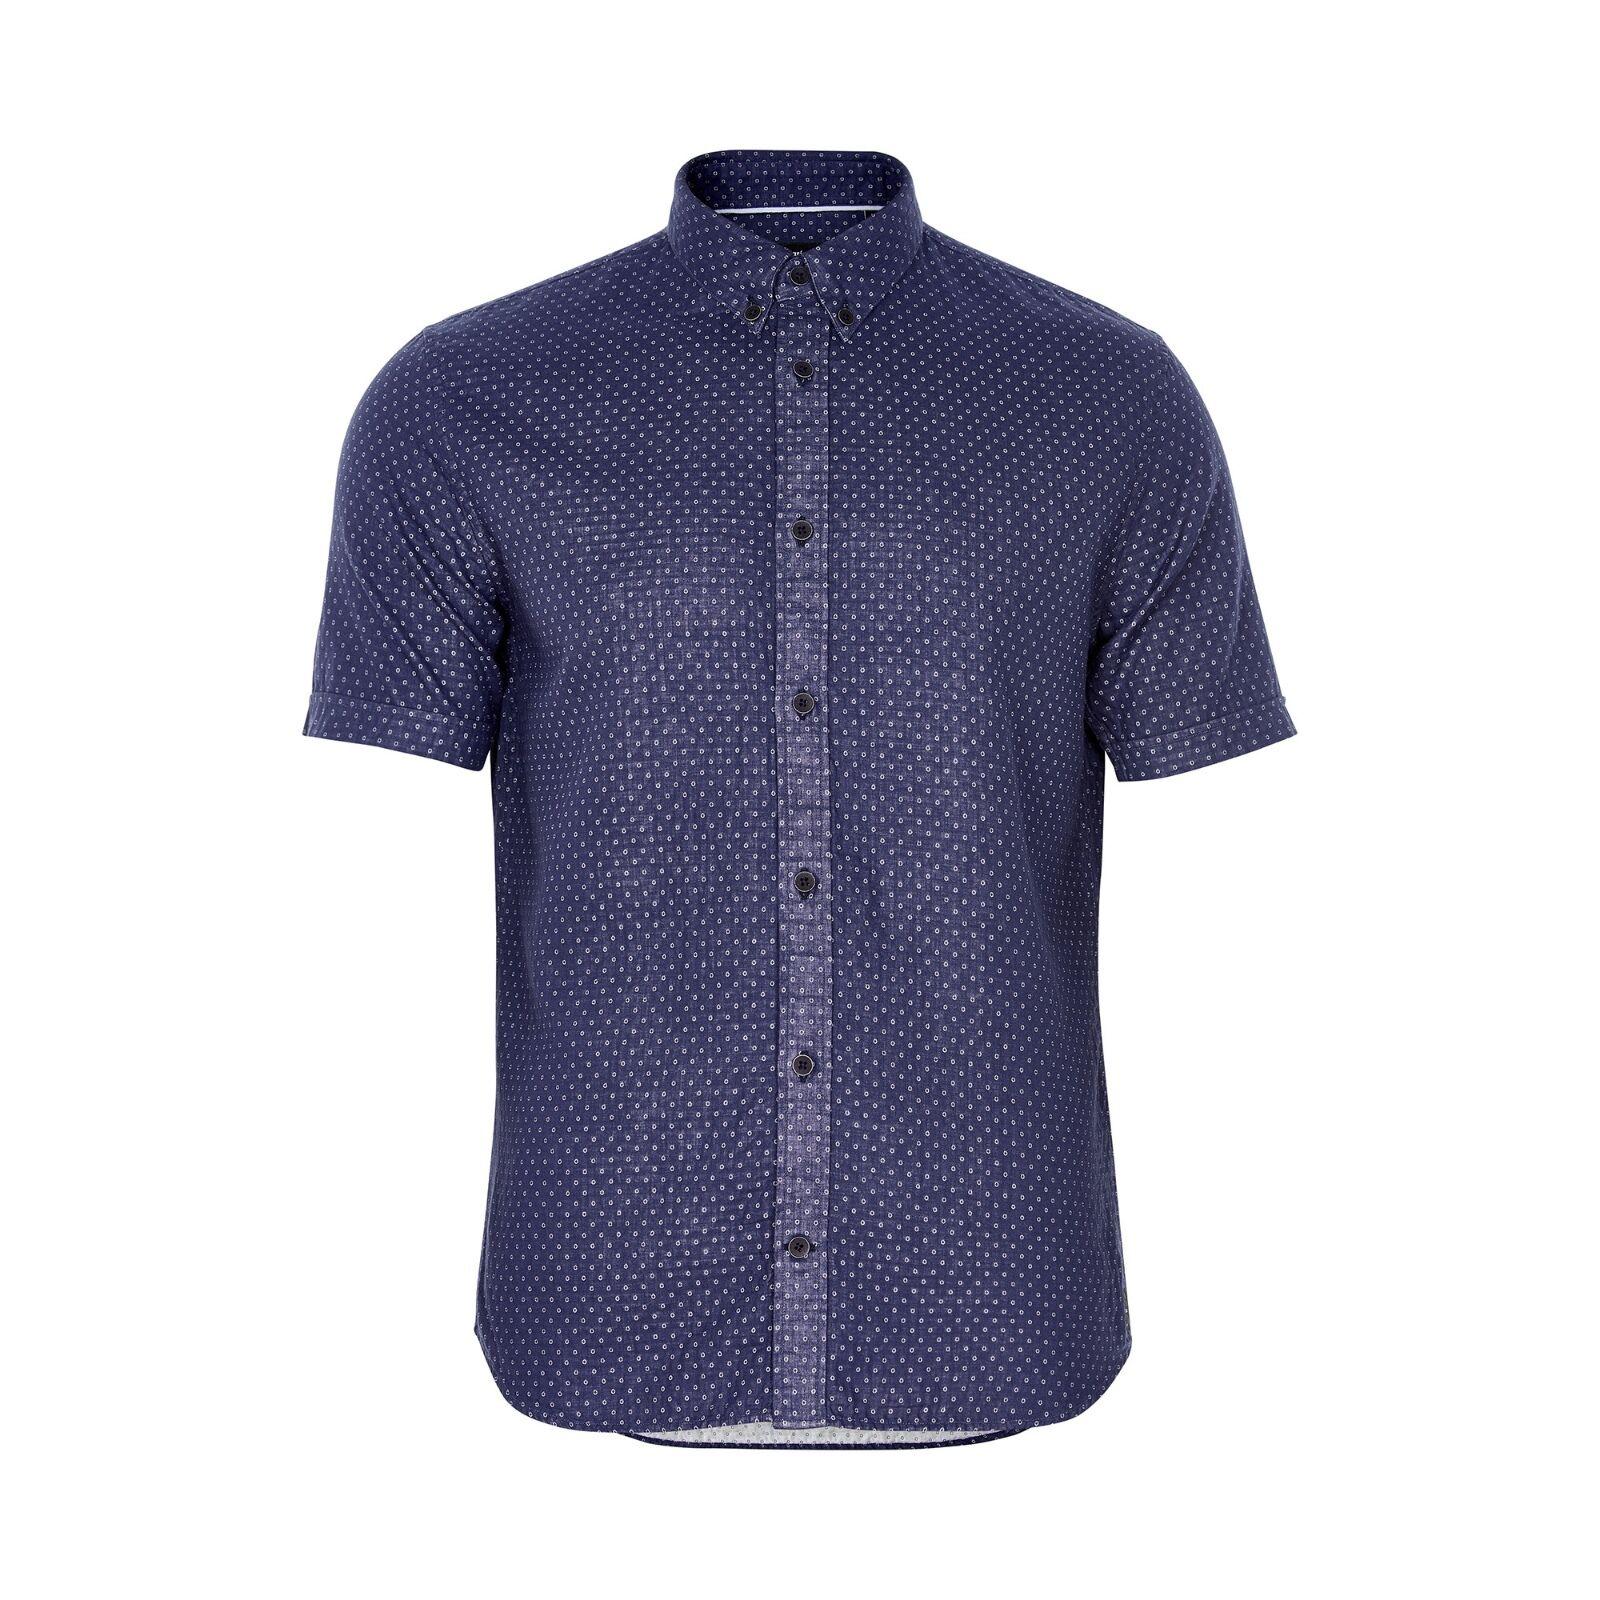 Matinique Trostol BD bluee Dot Shirt Navy Blazer - Large NEW AW17